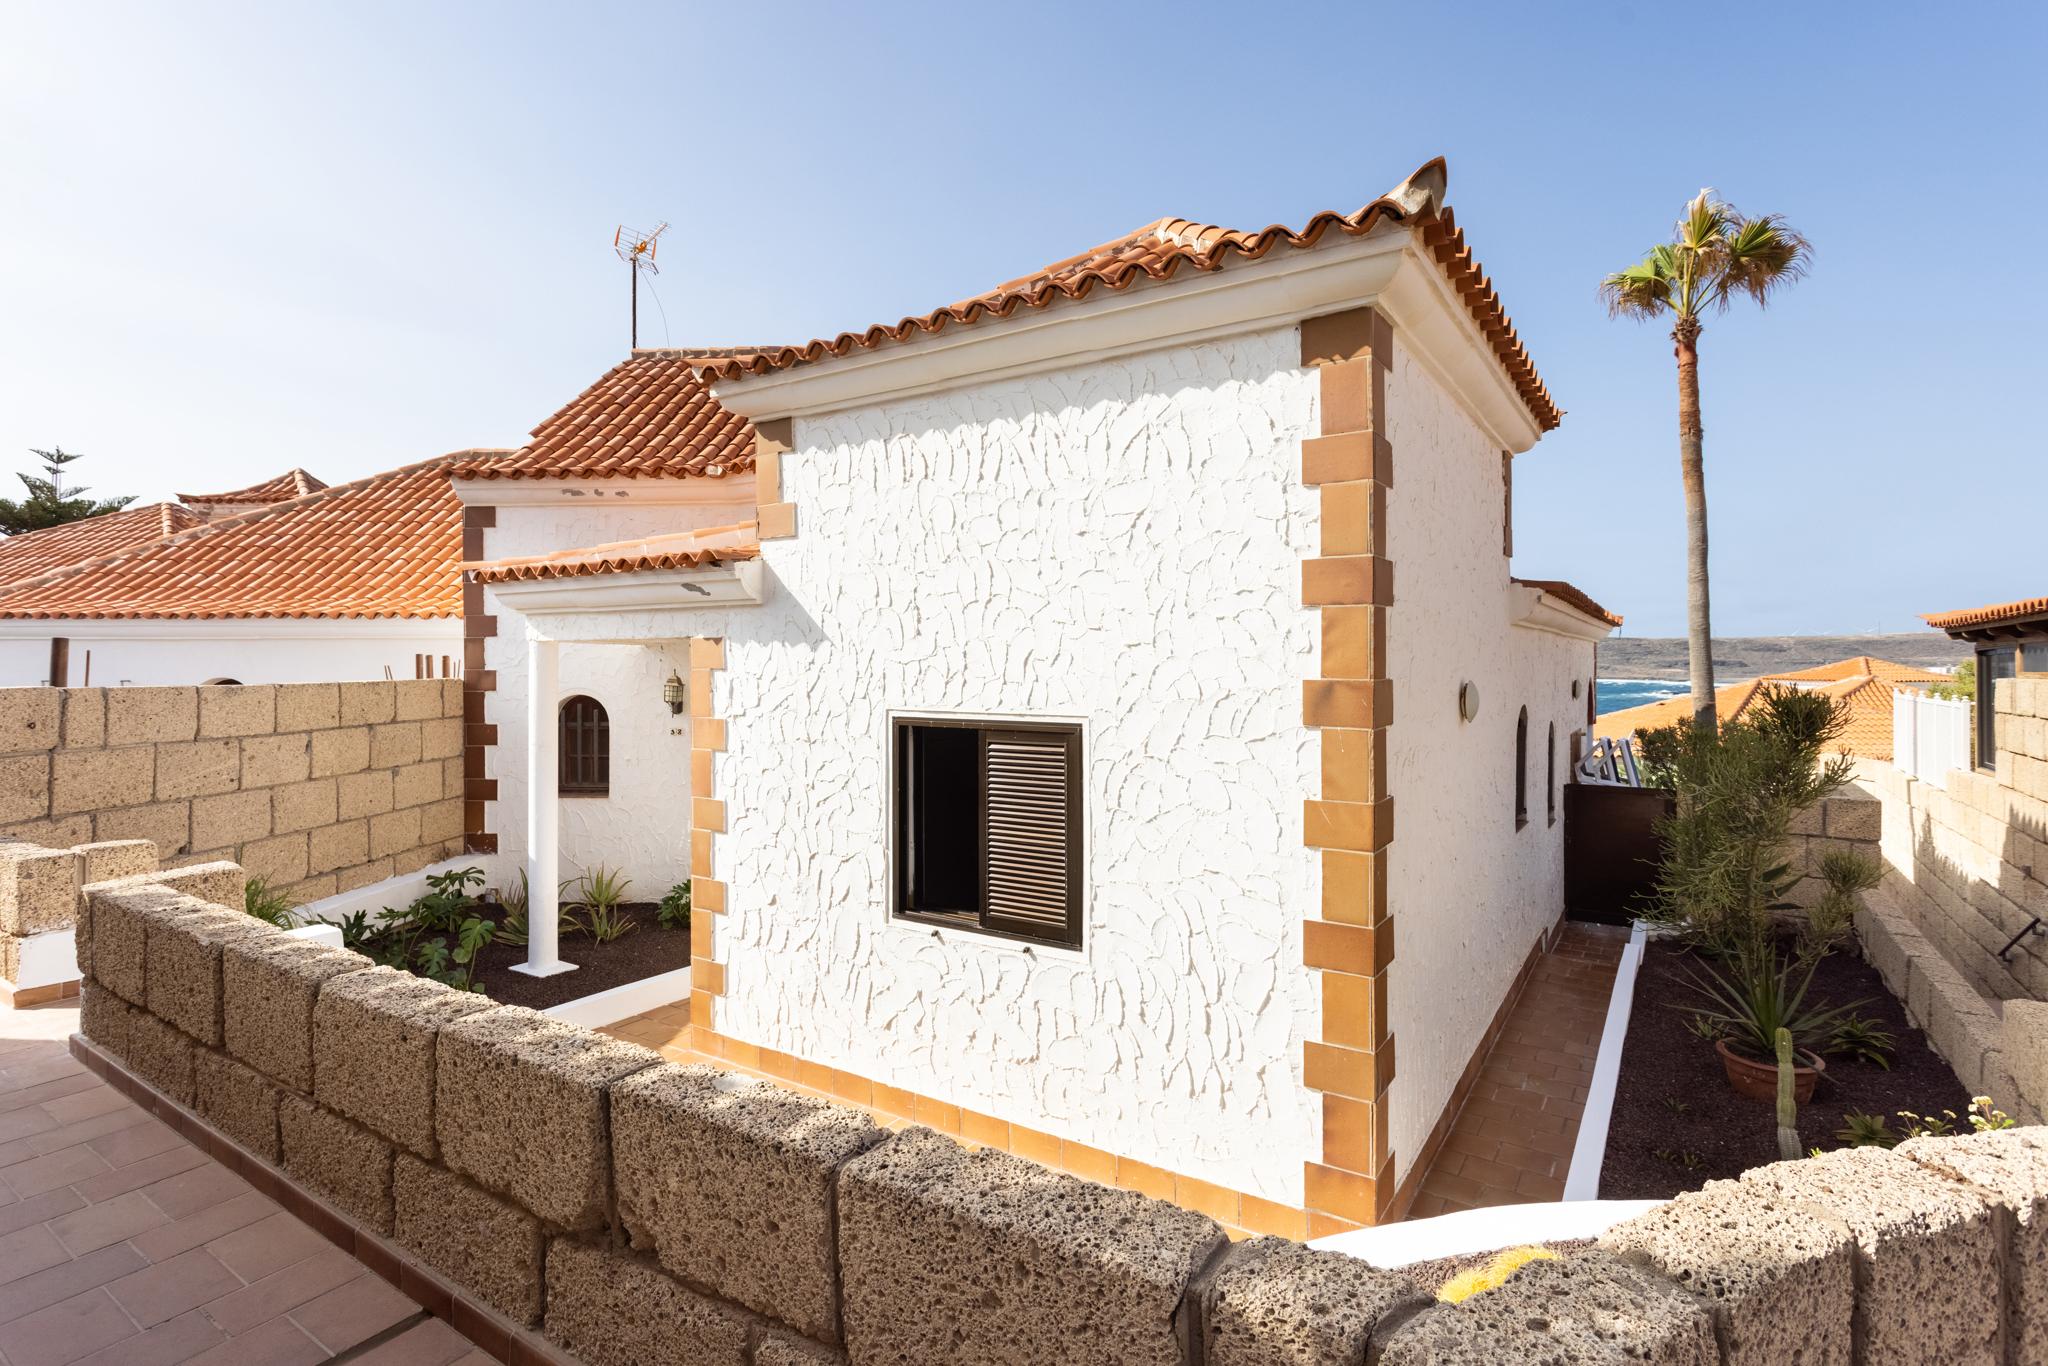 Holiday house direkt am Meer mit eigenem Pool (1671160), Poris de Abona, Tenerife, Canary Islands, Spain, picture 7